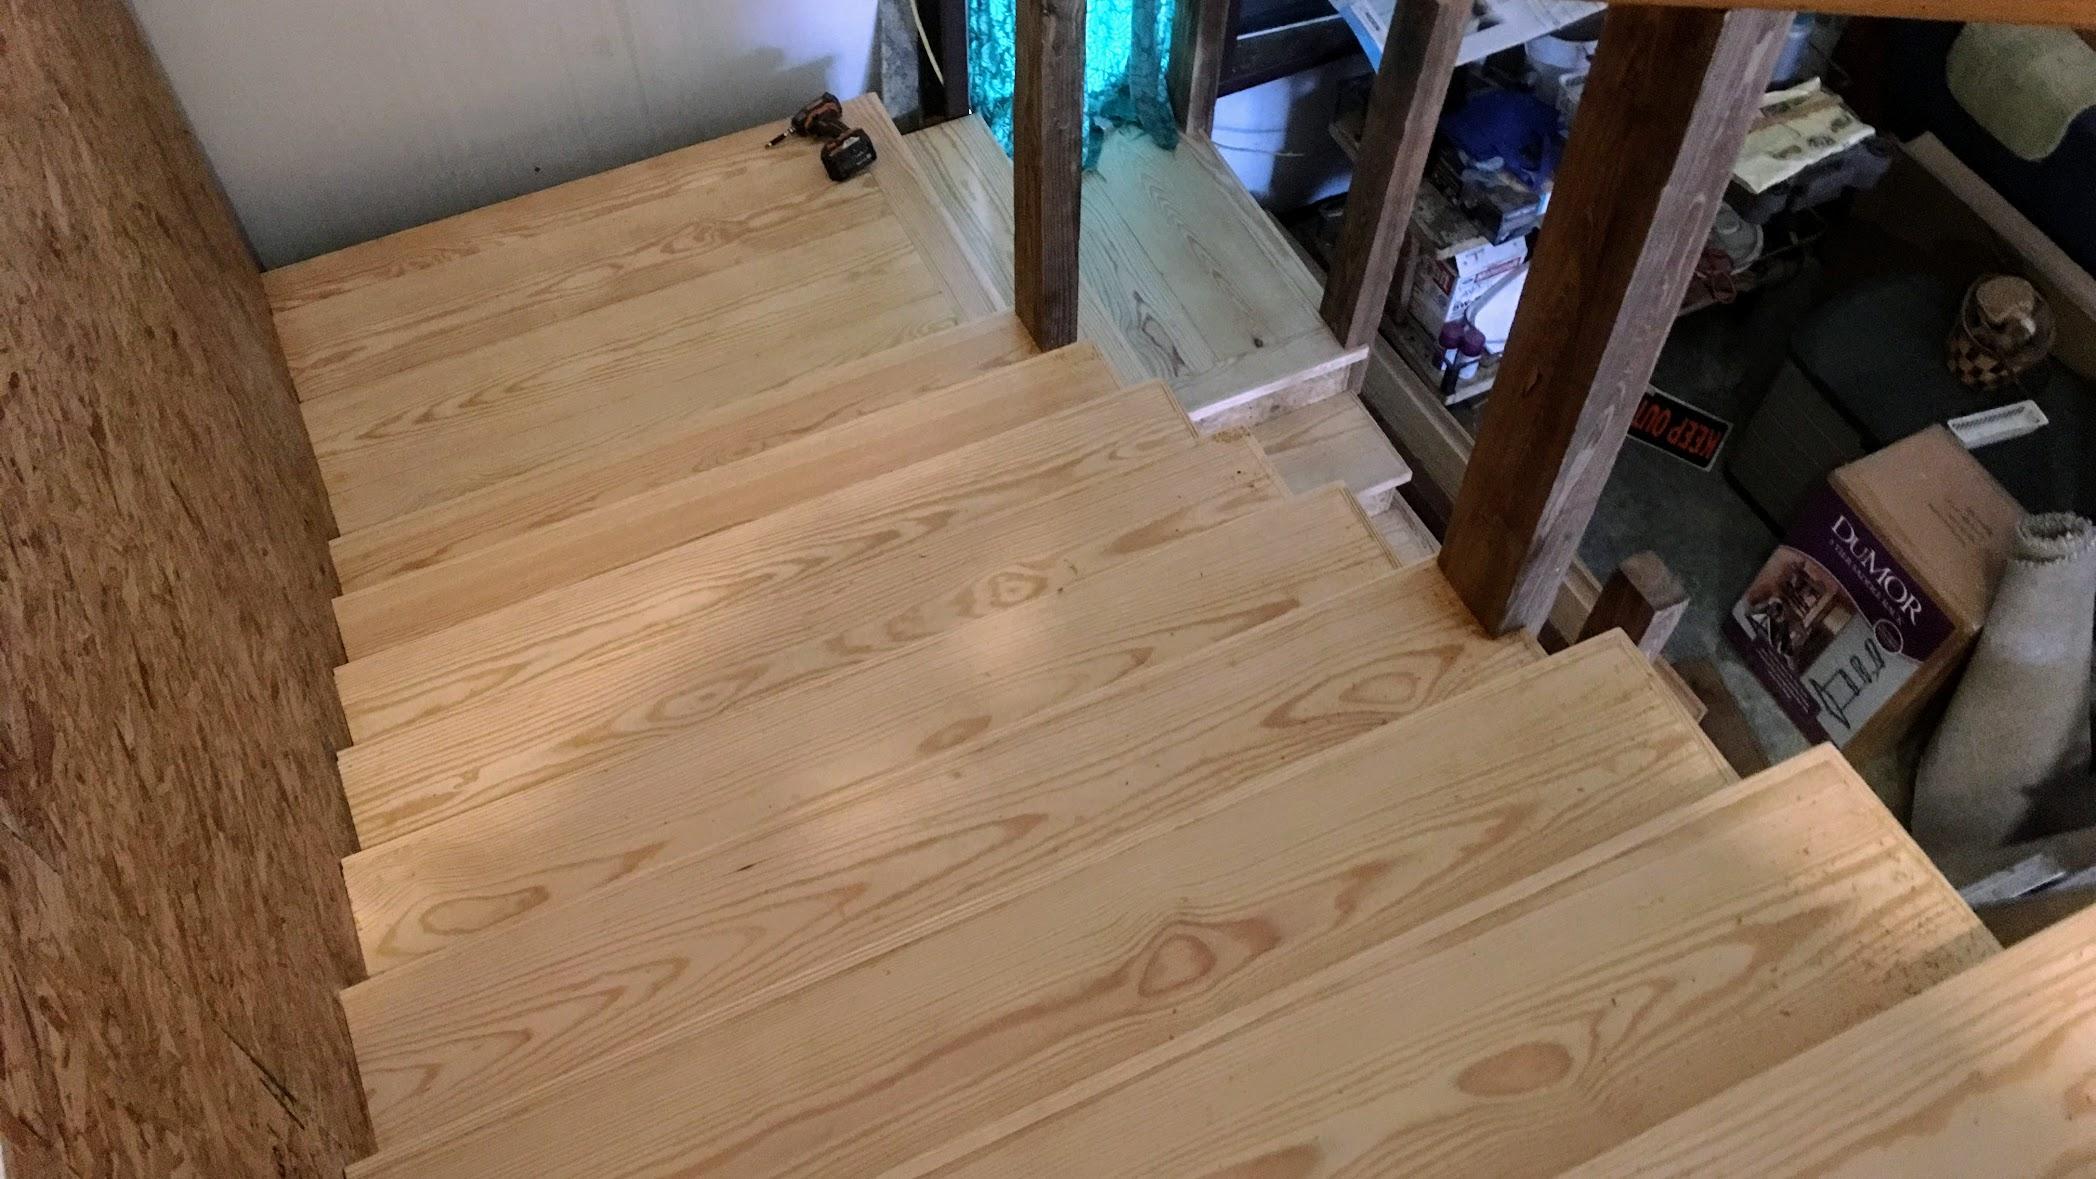 DIY Rustic Pine Stair Treads for a Farmhouse Staircase in a barndominium